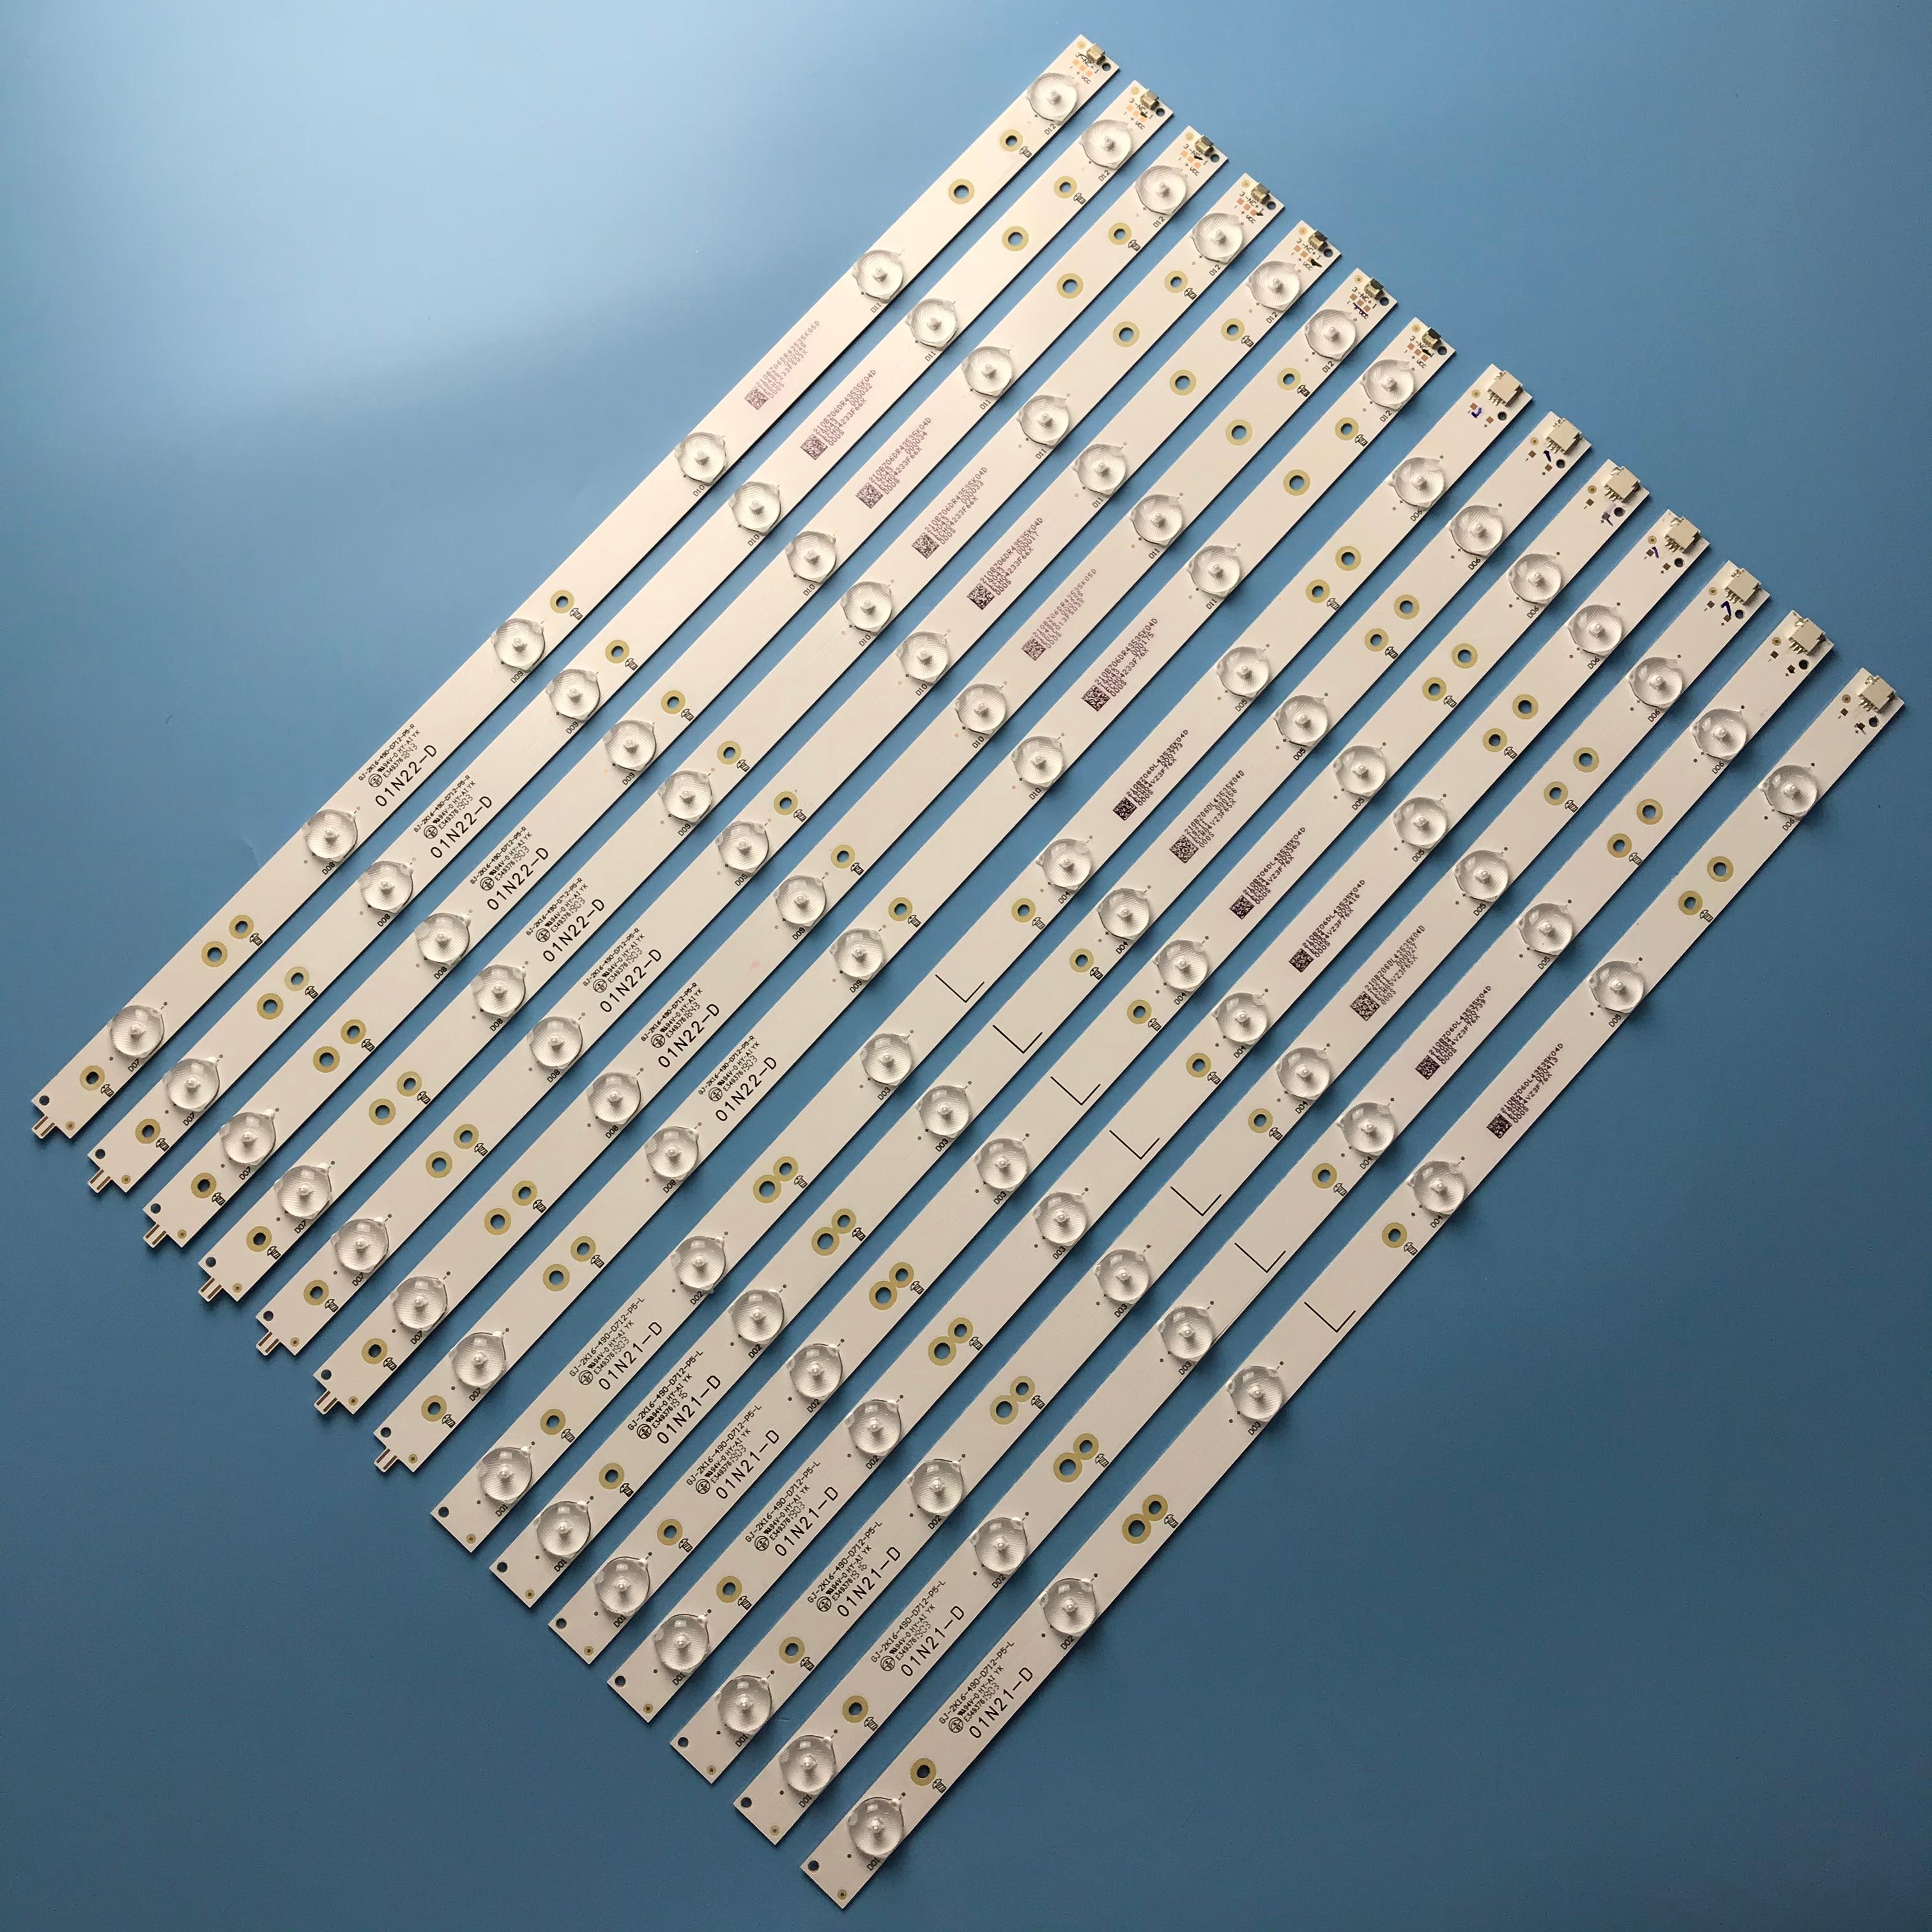 Tira de LED para iluminación trasera 6 + 6leds GJ-2K16-490-D712-P5-L + R para Philips 49 49PUS6401 49PUS6501 49PUH6101 49PUS6561/12 49PUS6101/12